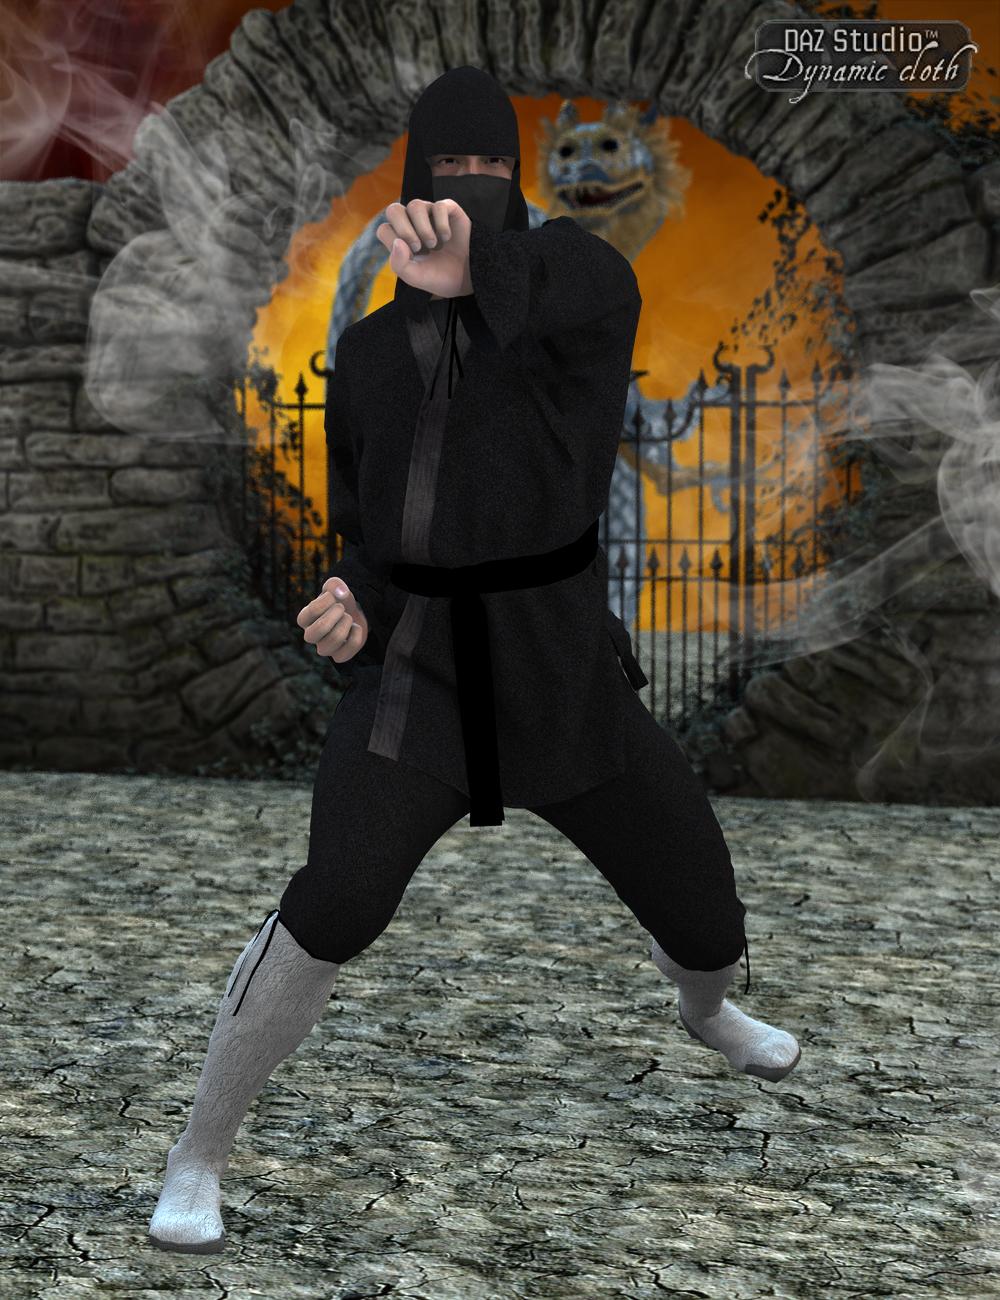 Dynamic Ninja Suit for Michael 5 by: SimonWMOptiTex, 3D Models by Daz 3D